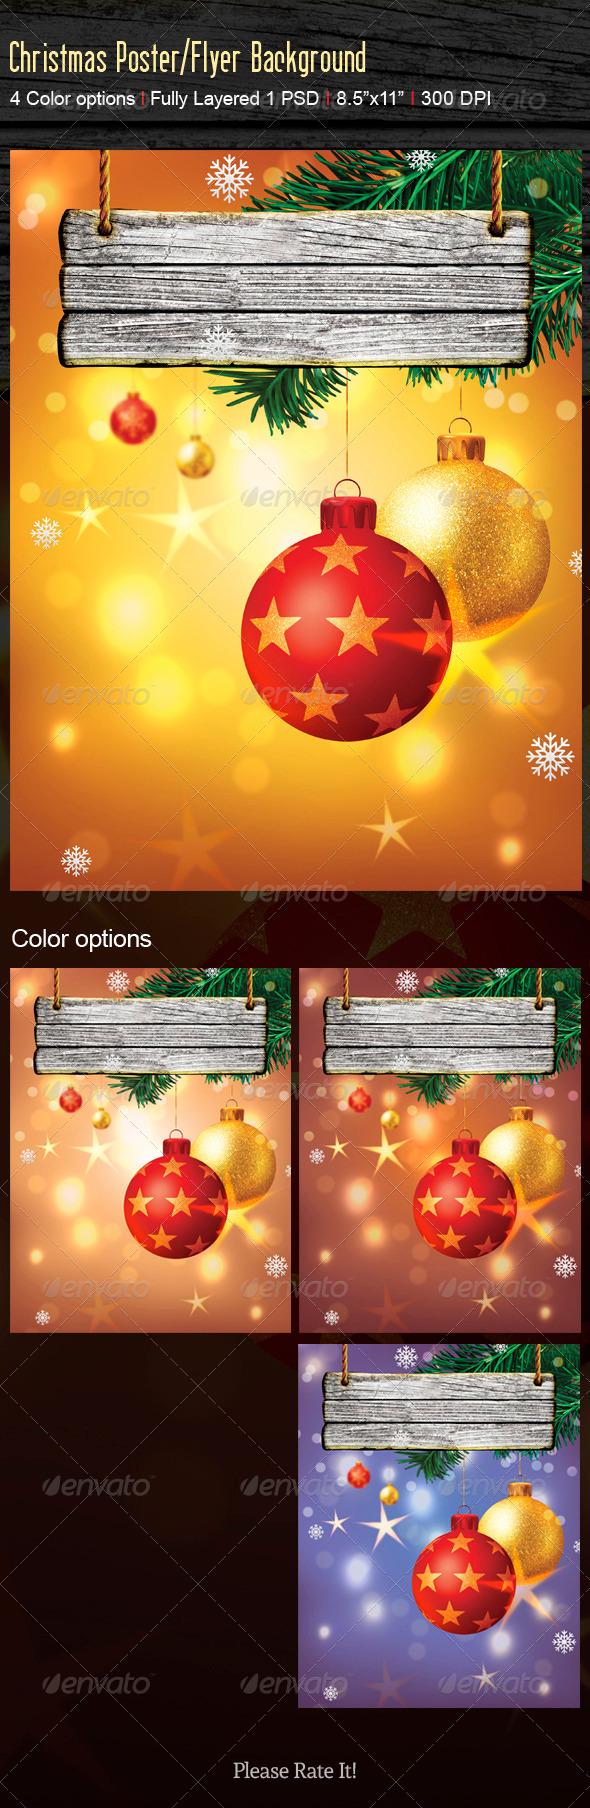 Christmas Flyer Beackground